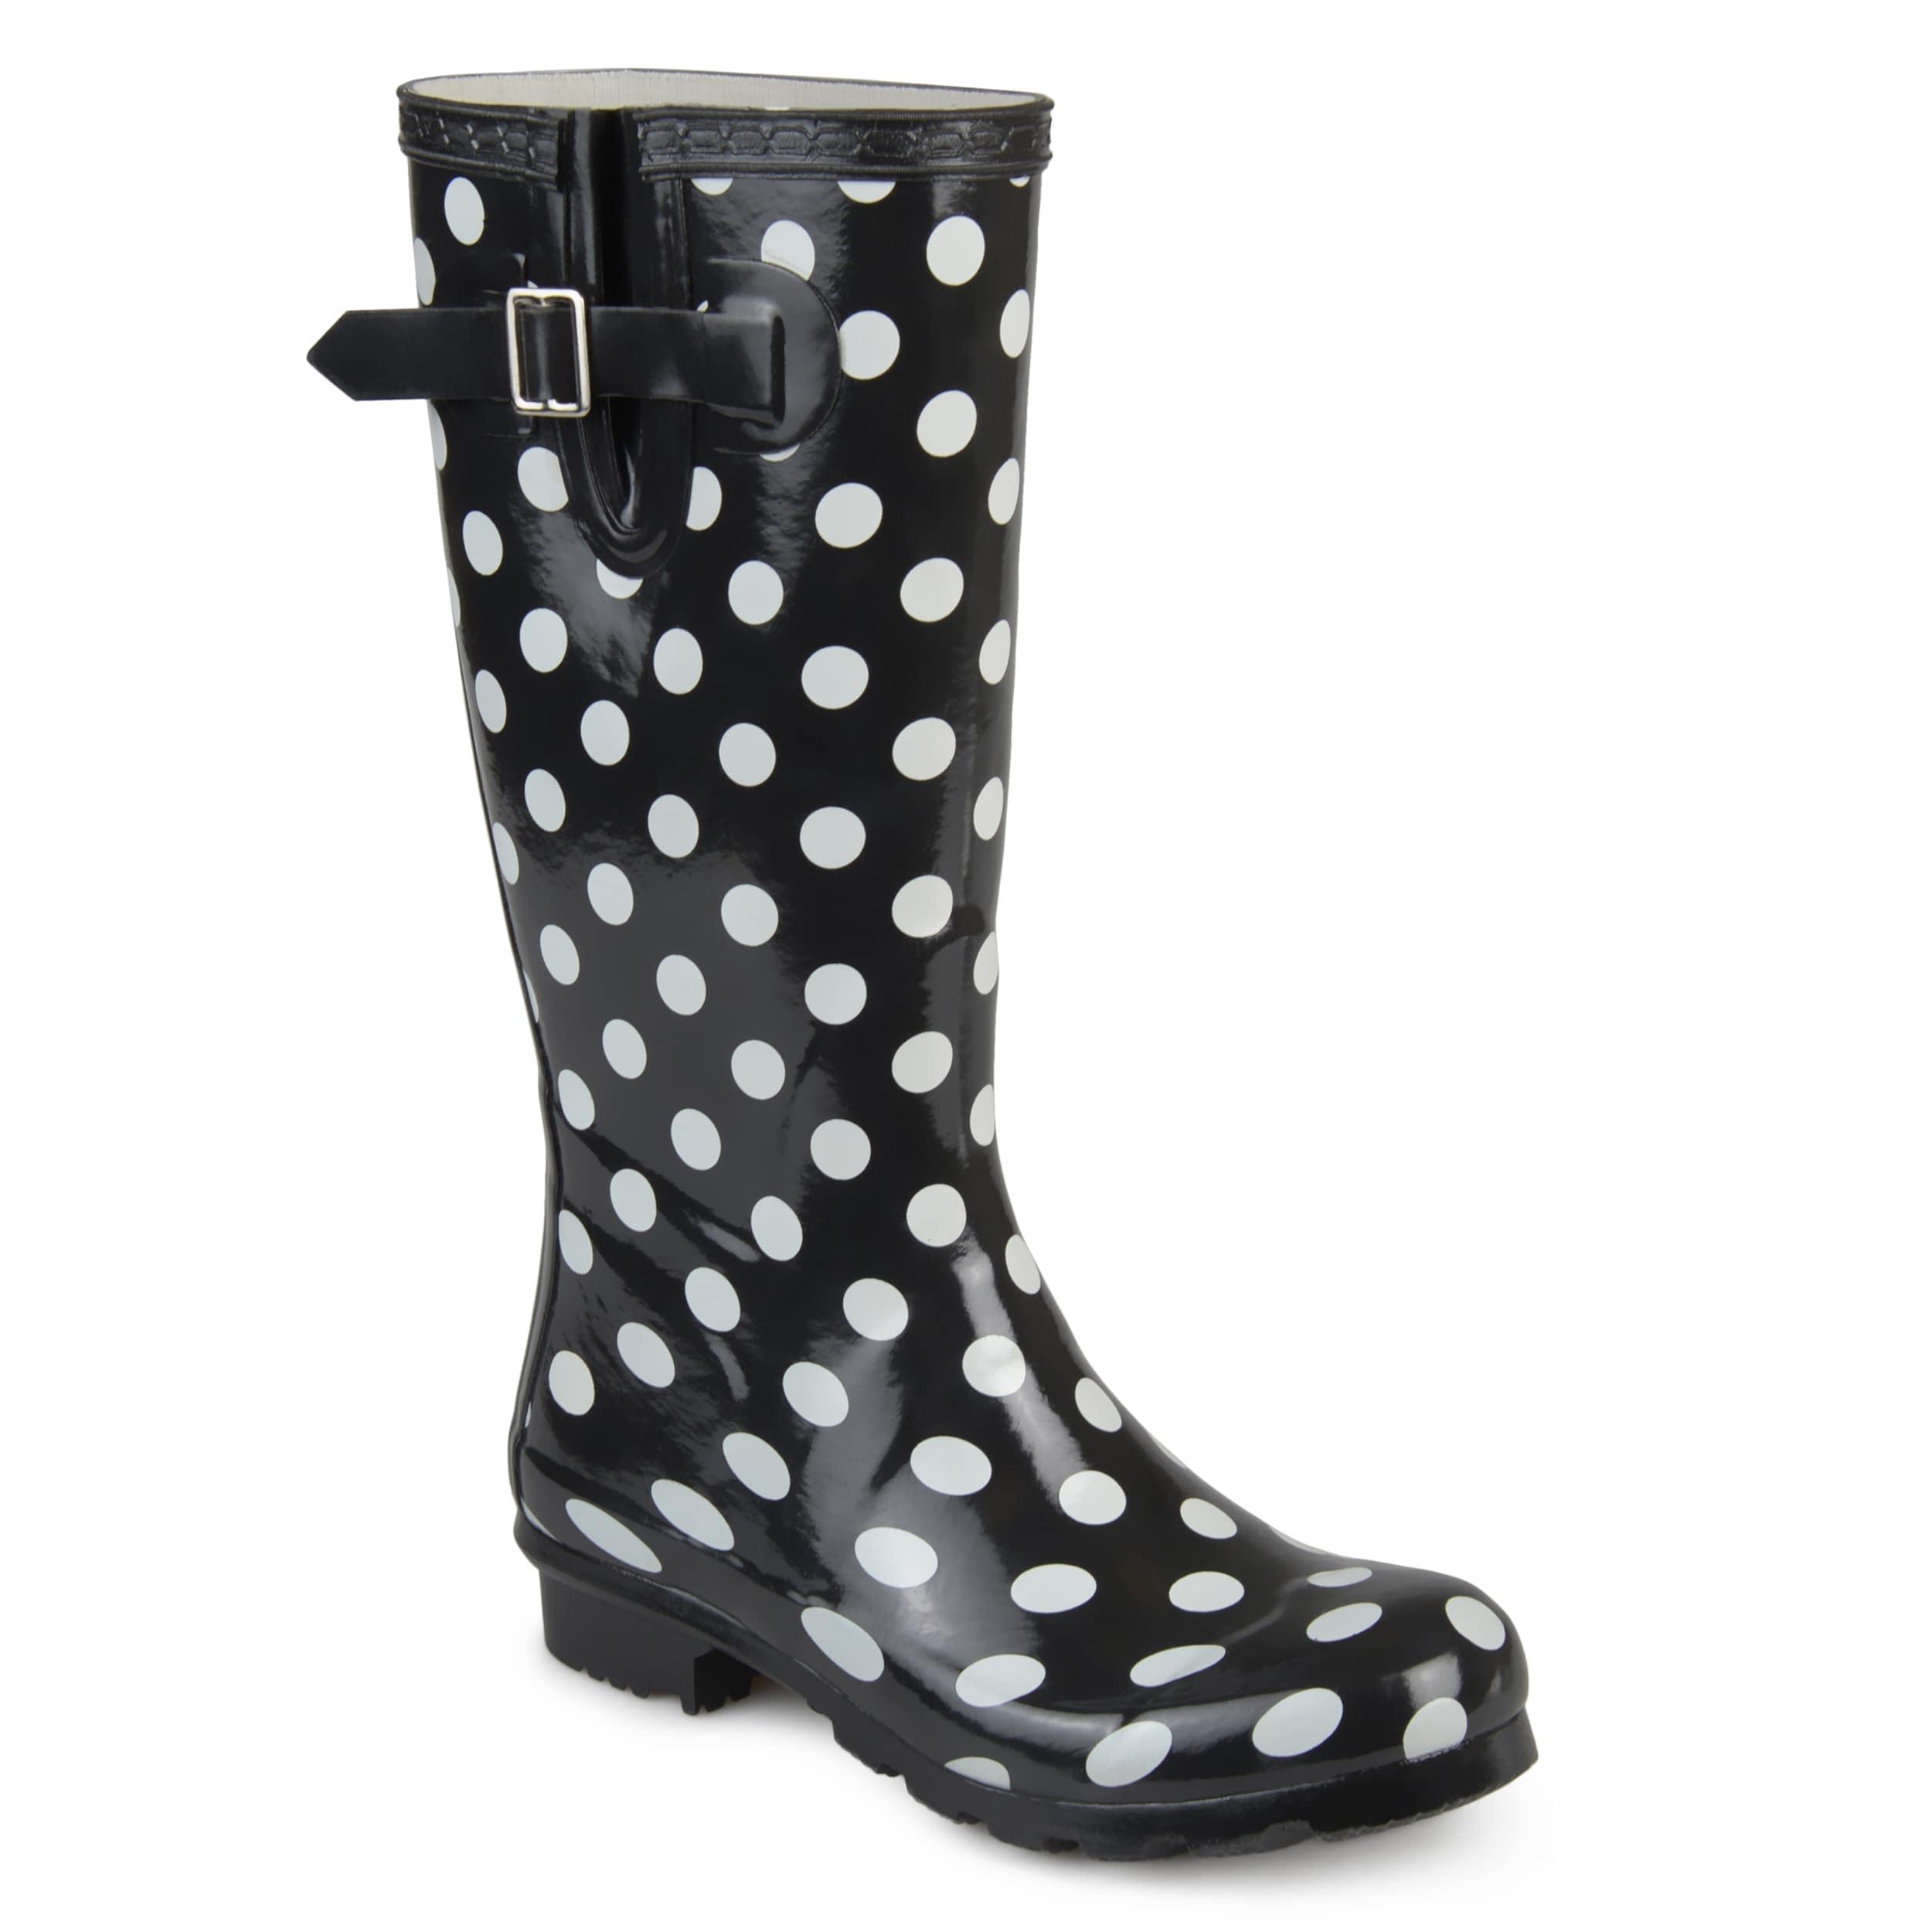 Patterned Rain Boots Interesting Decoration